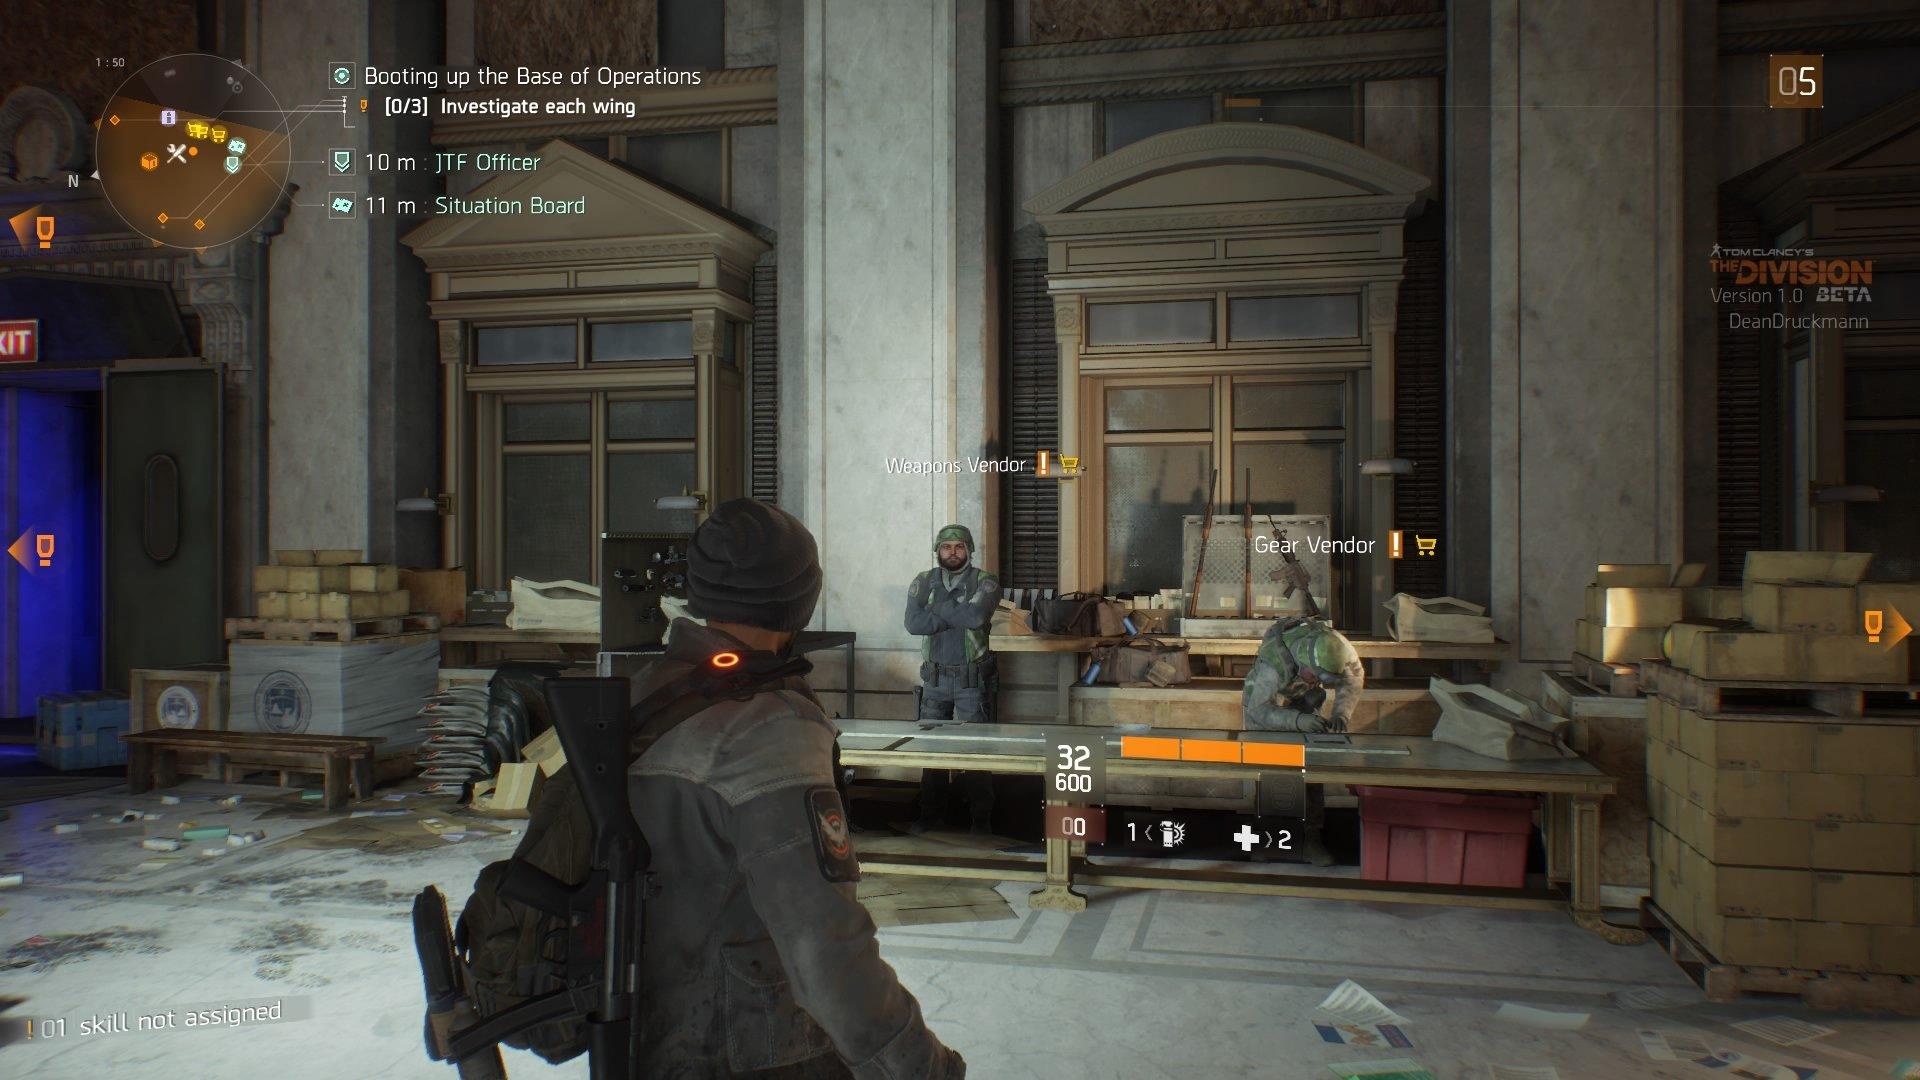 Beta Tom Clancy's The Division™ После 17 часов - Изображение 6